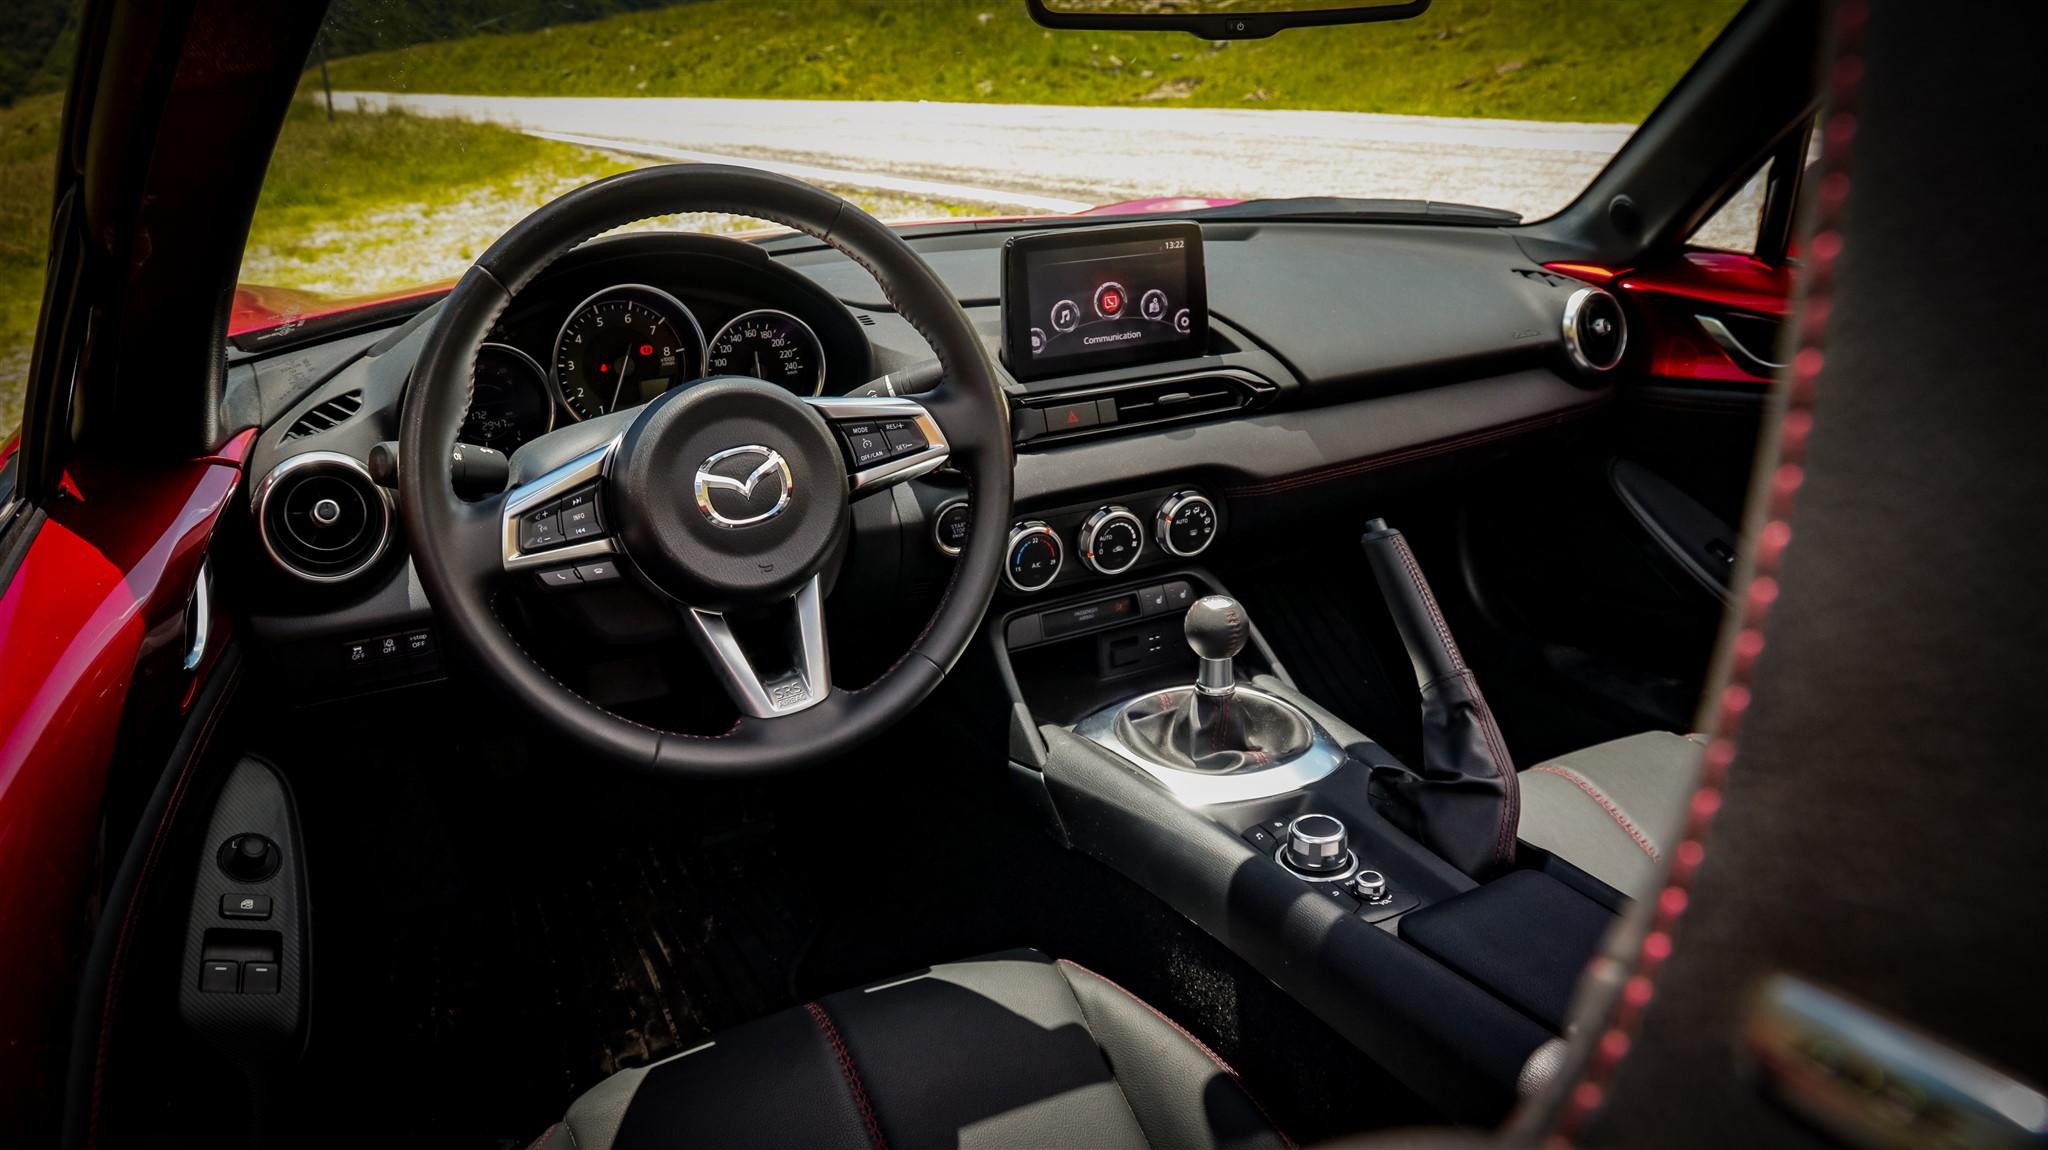 Mazda MX-5 2019 Skyactiv G184 M6 interior